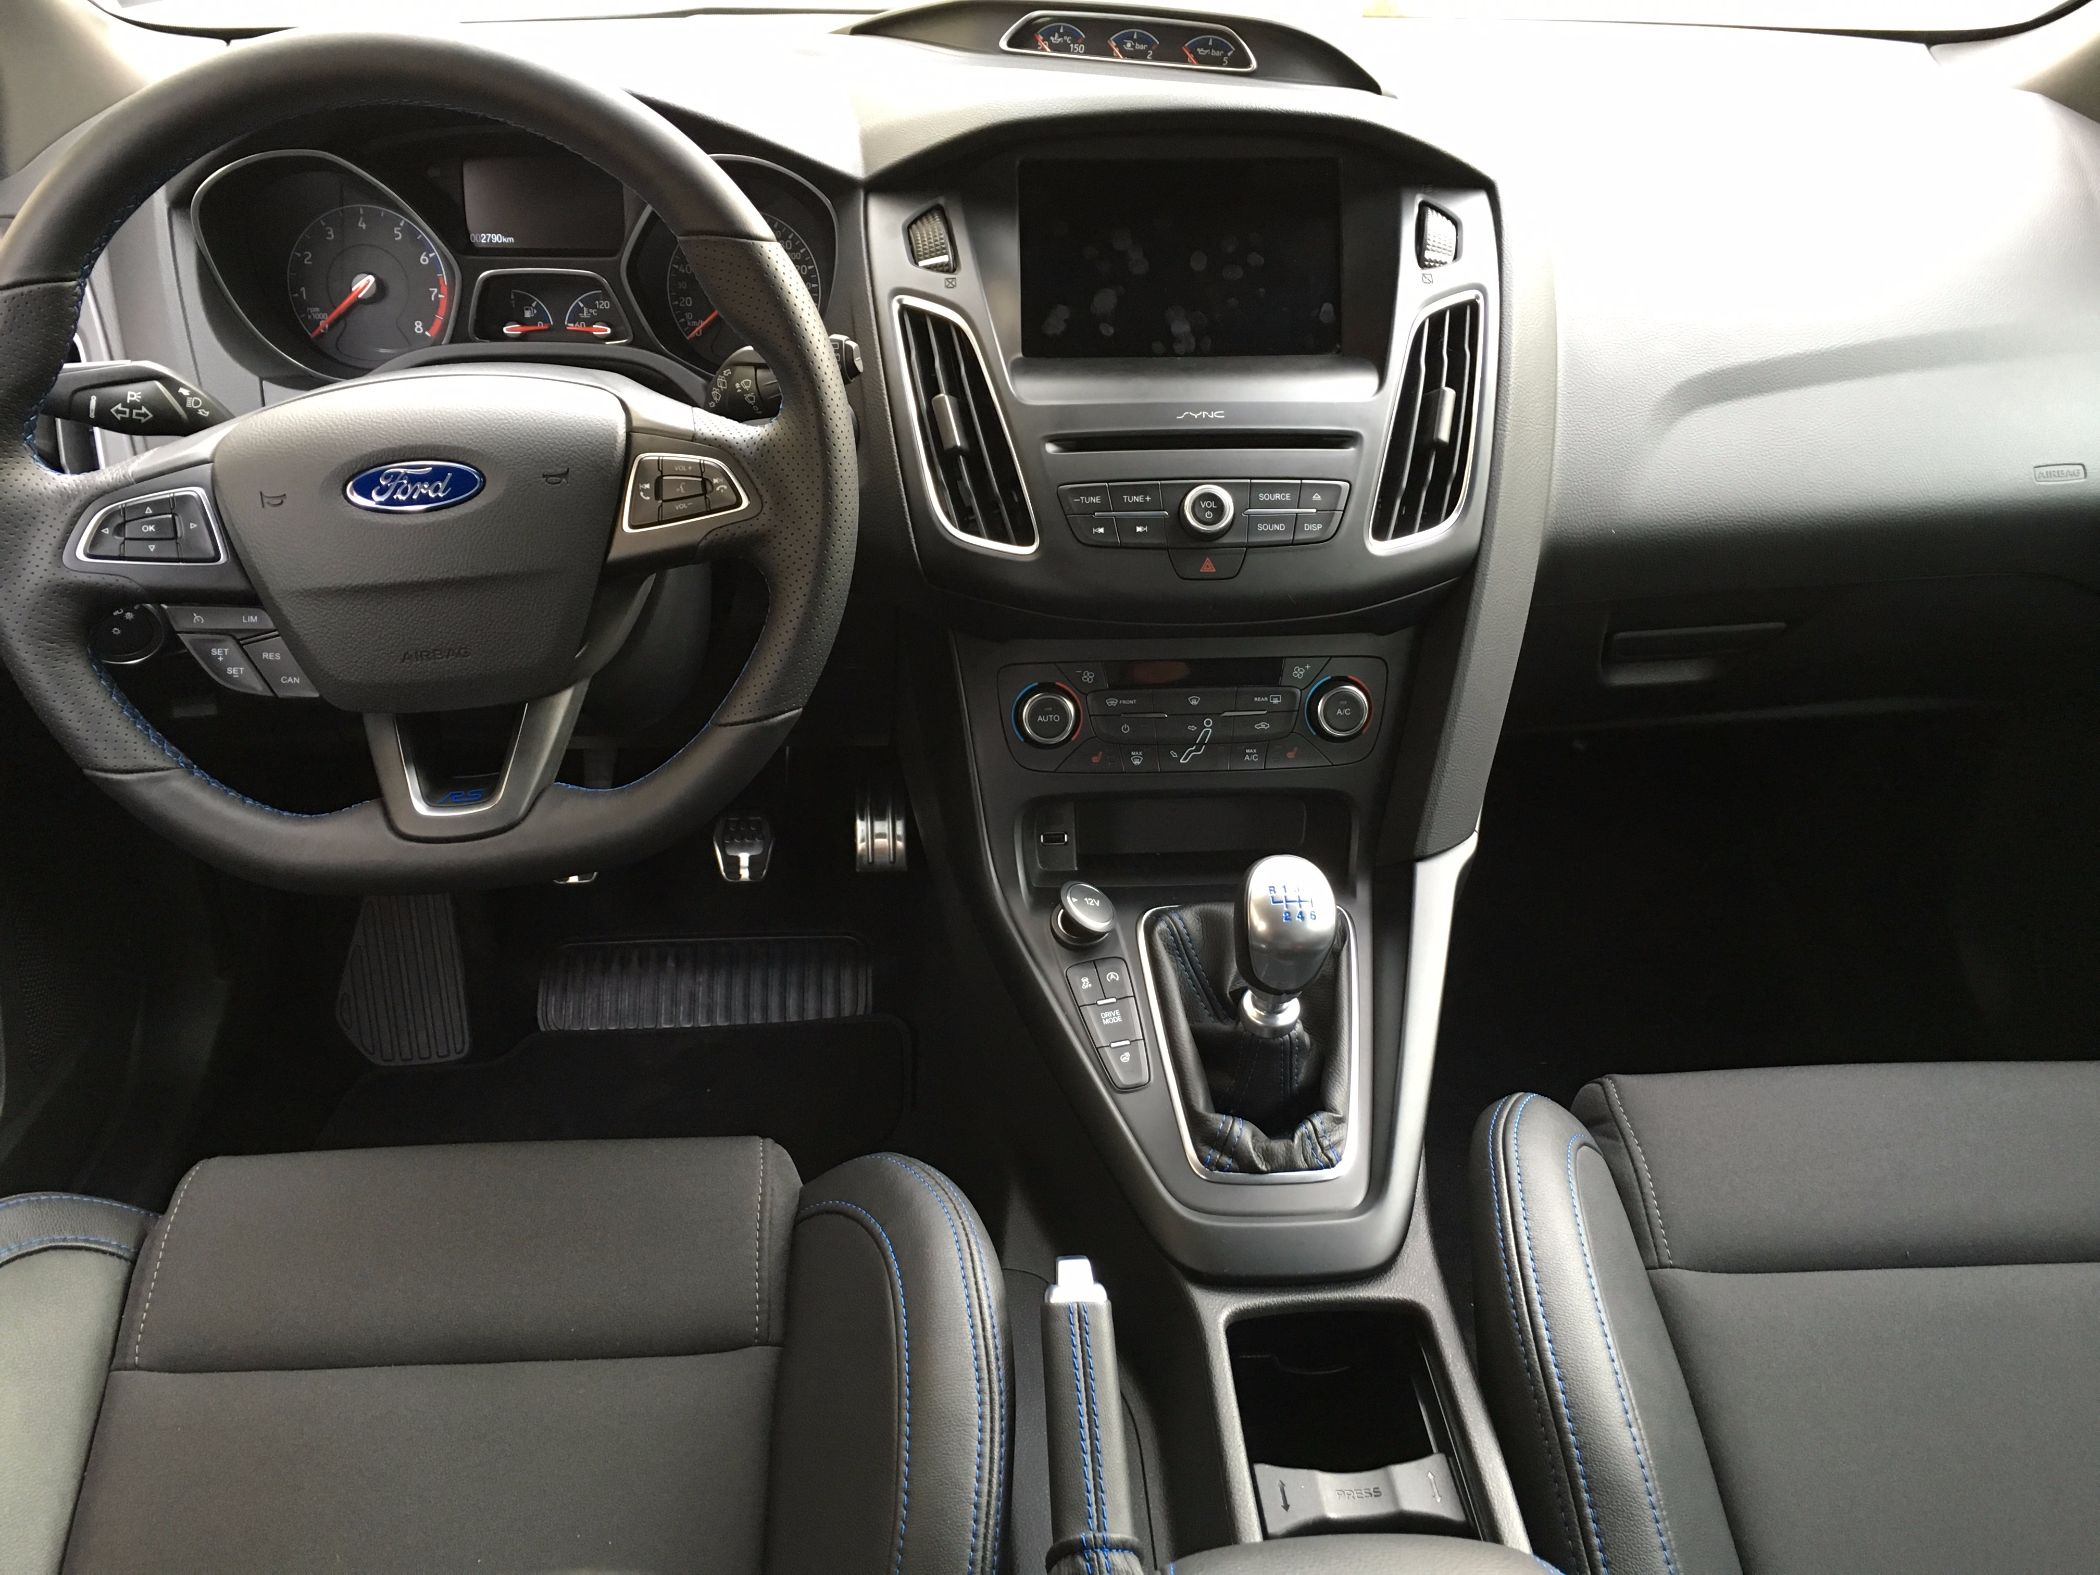 Ford Focus RS Cockpit 2016